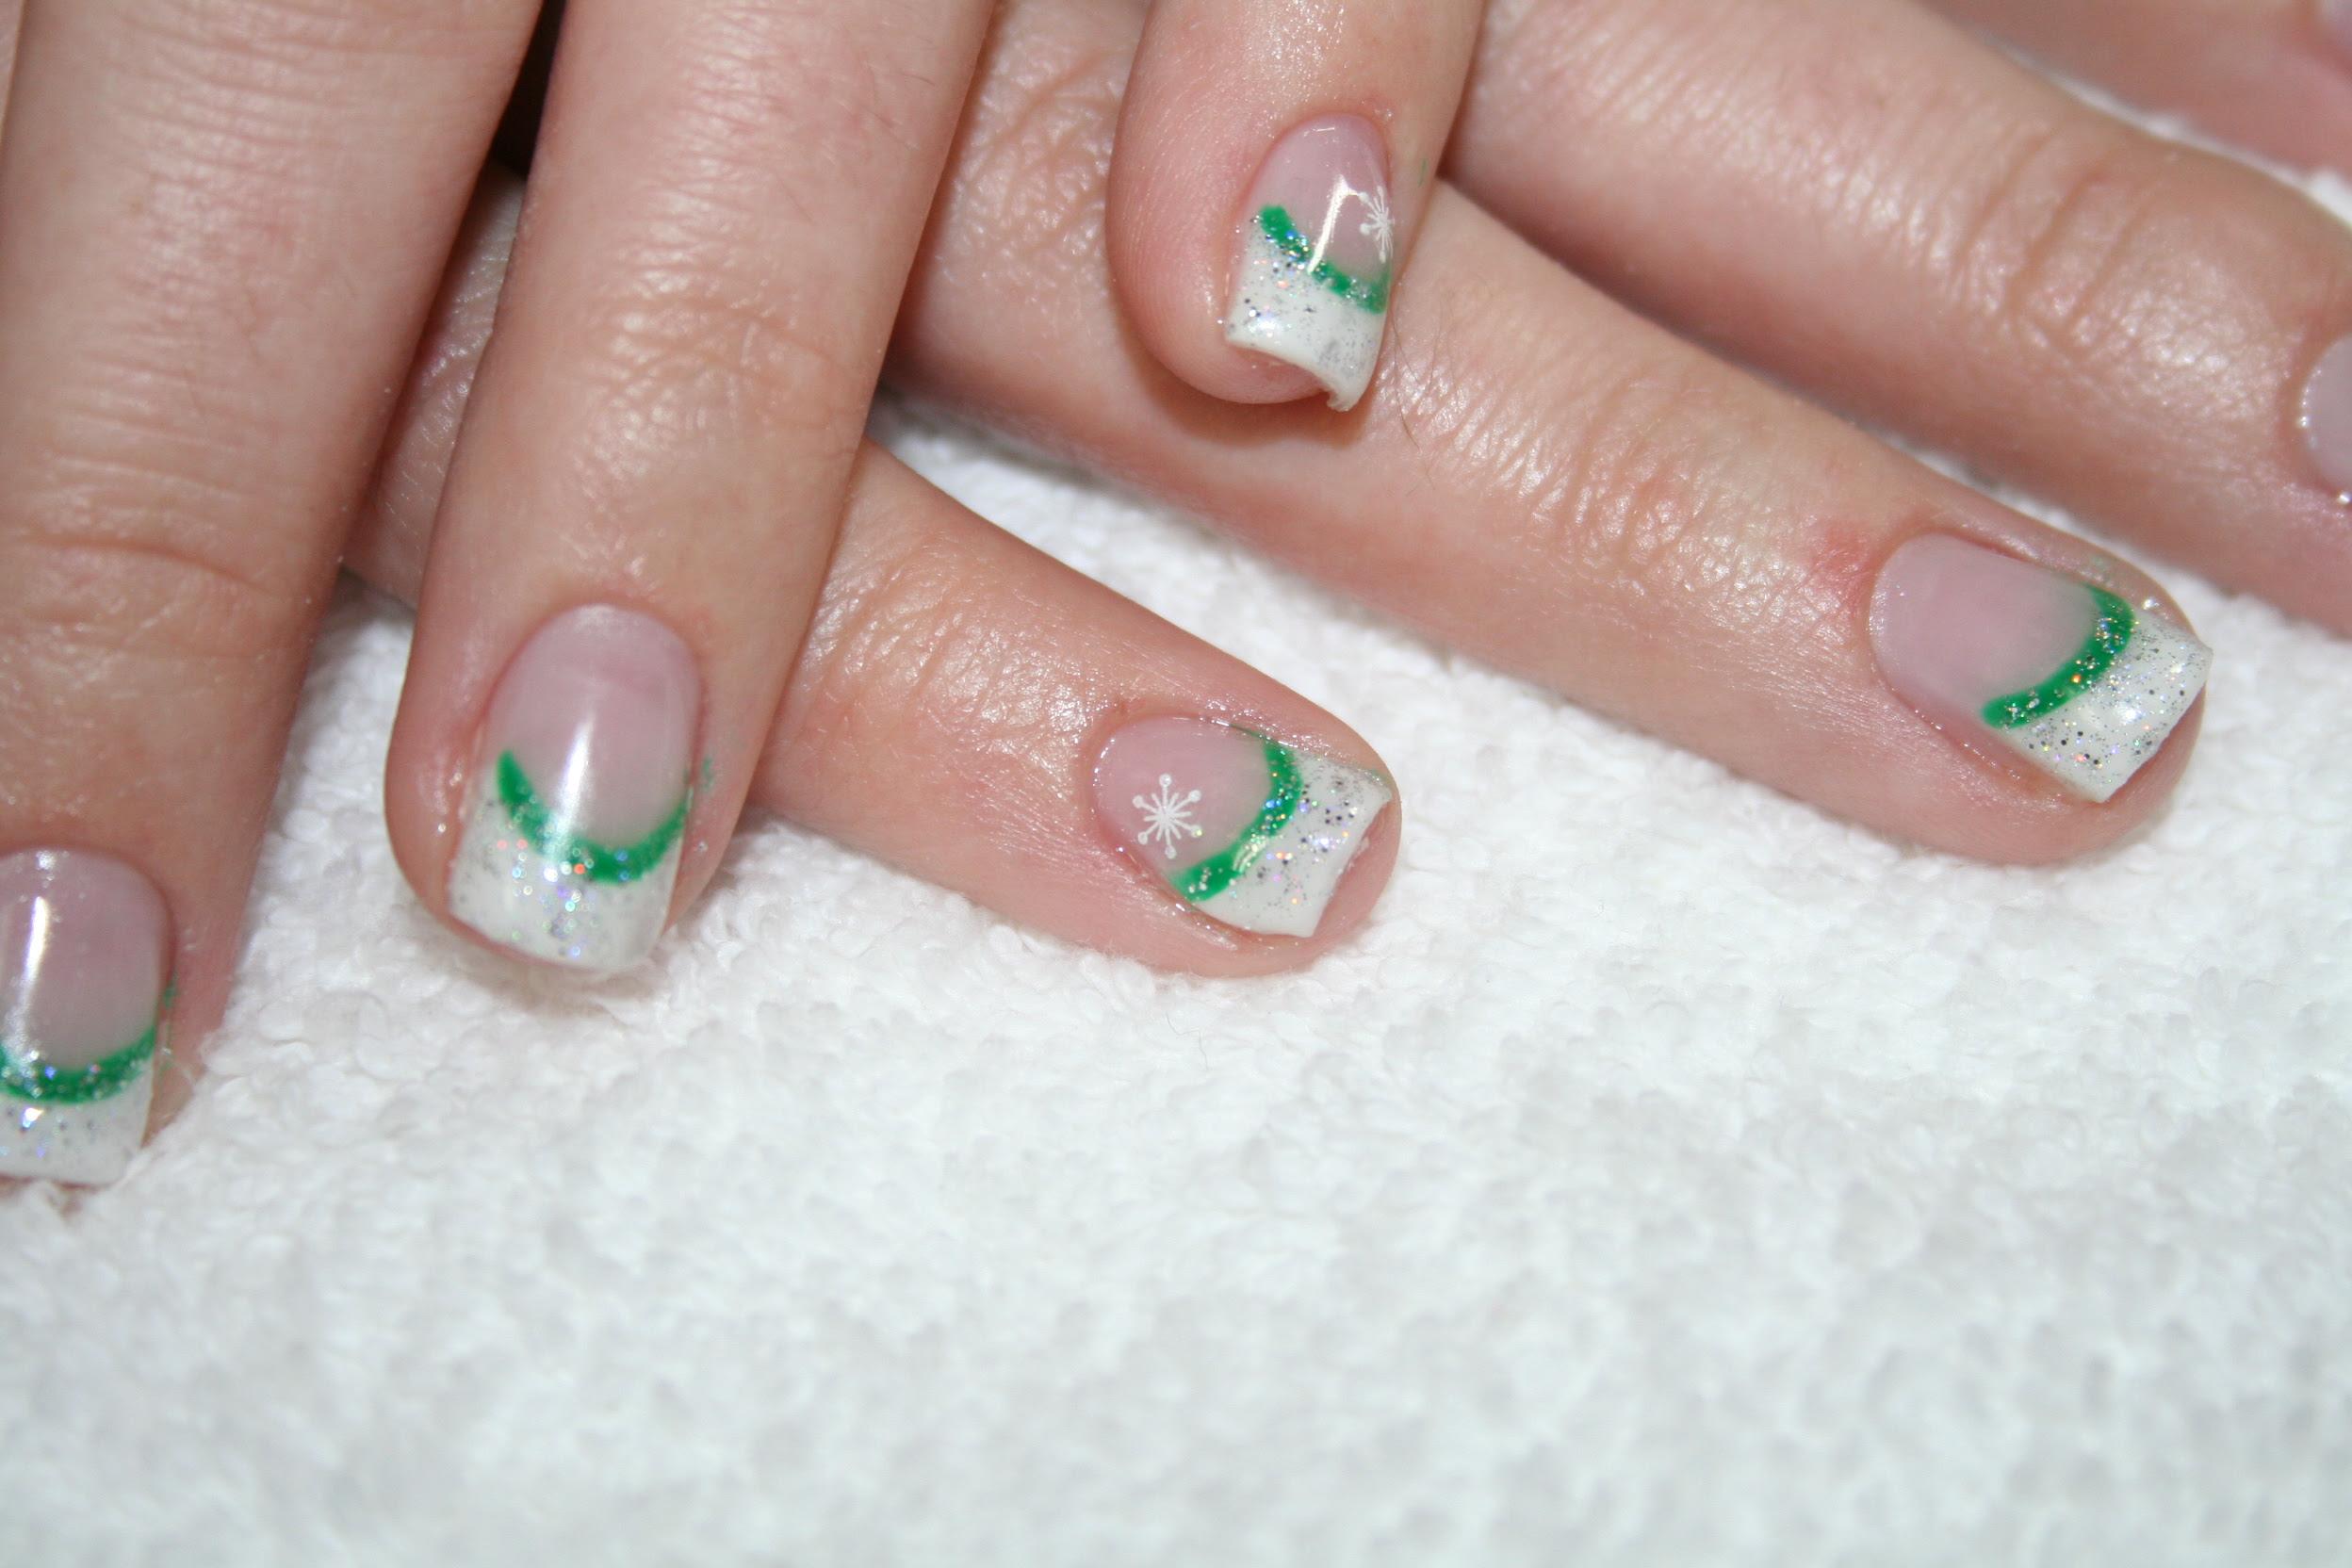 Contemporary Christmas Gel Nail Designs Embellishment - Nail Art ...